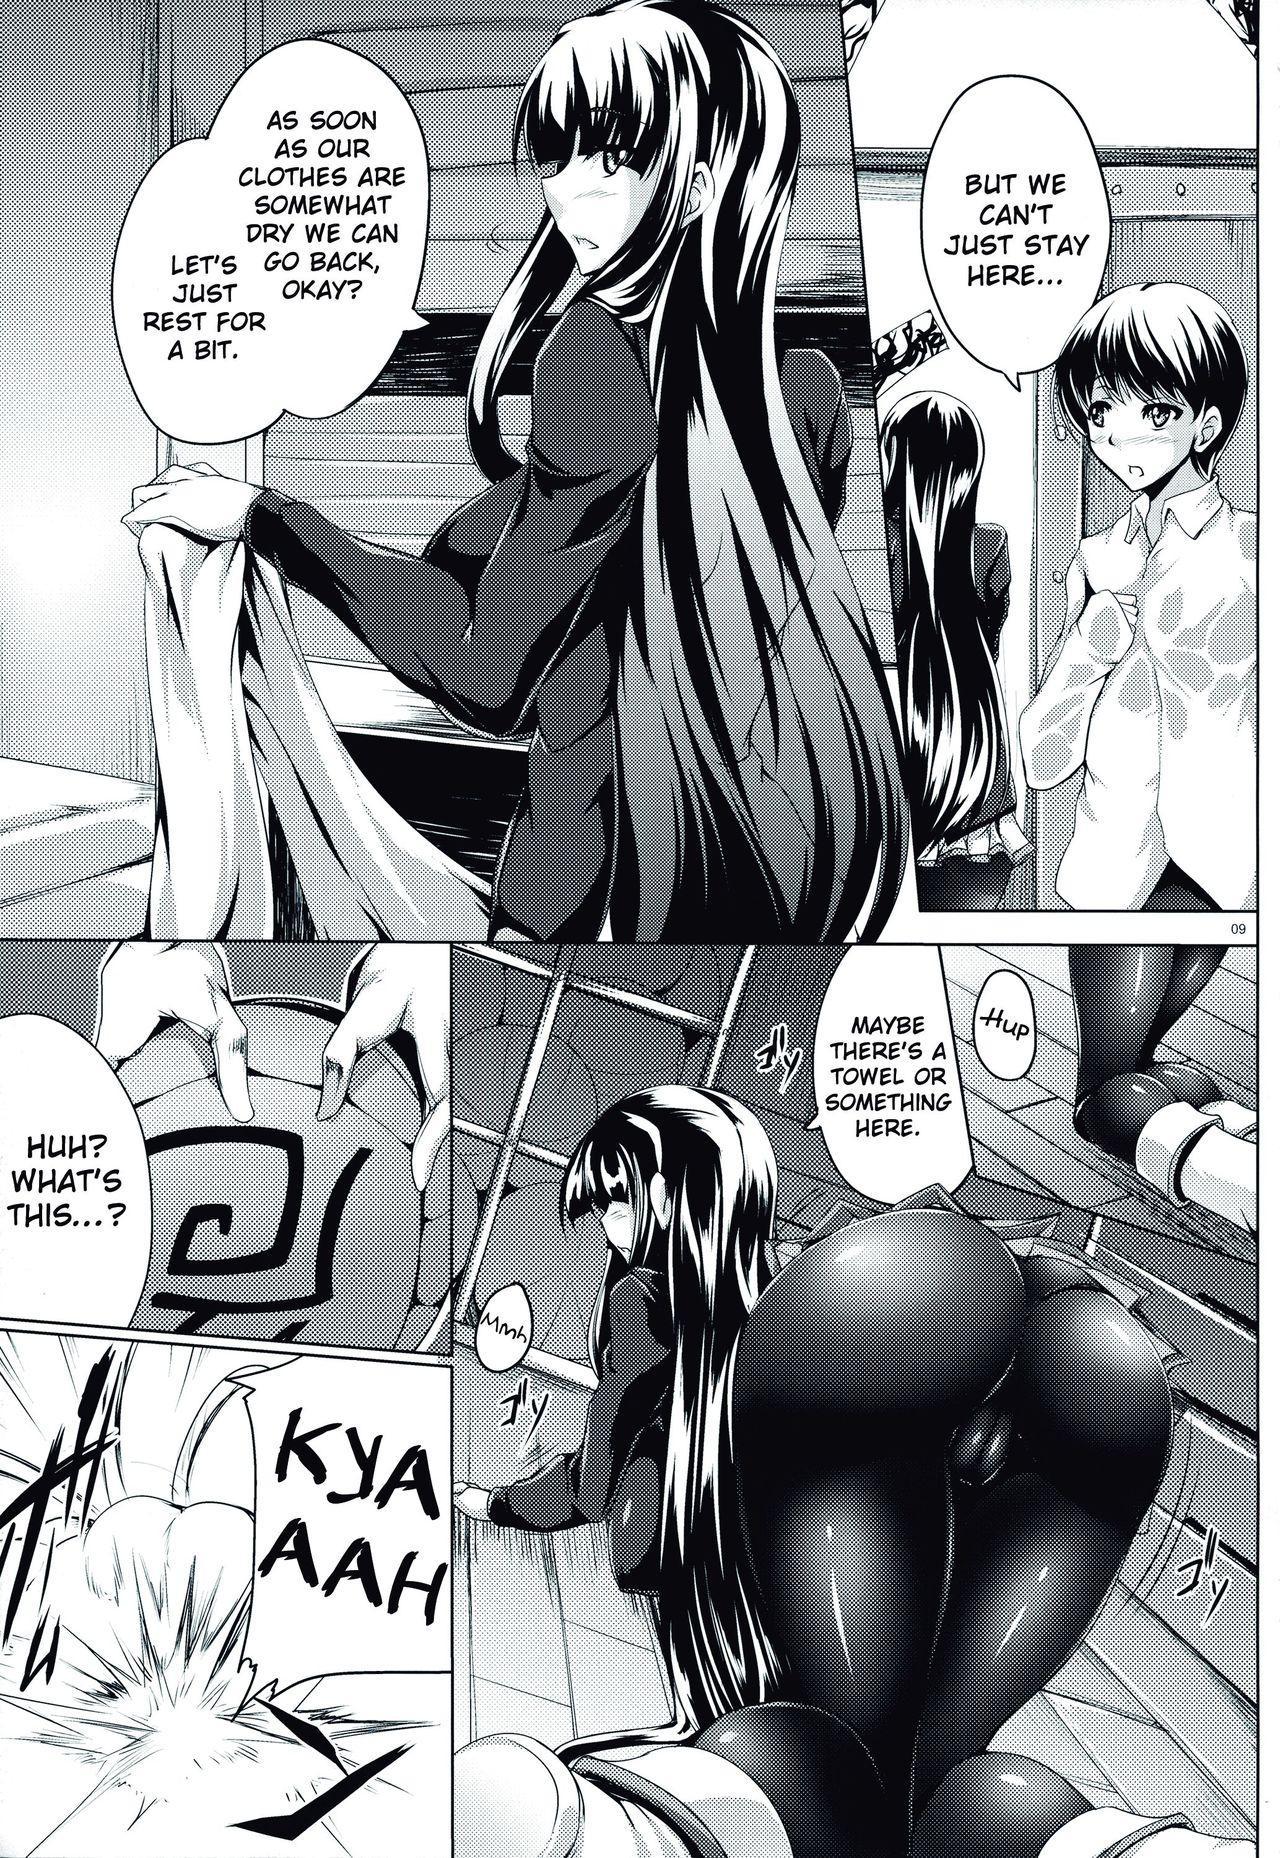 Jijoujibaku no Innocent | Innocent Caught in Her Own Trap 7